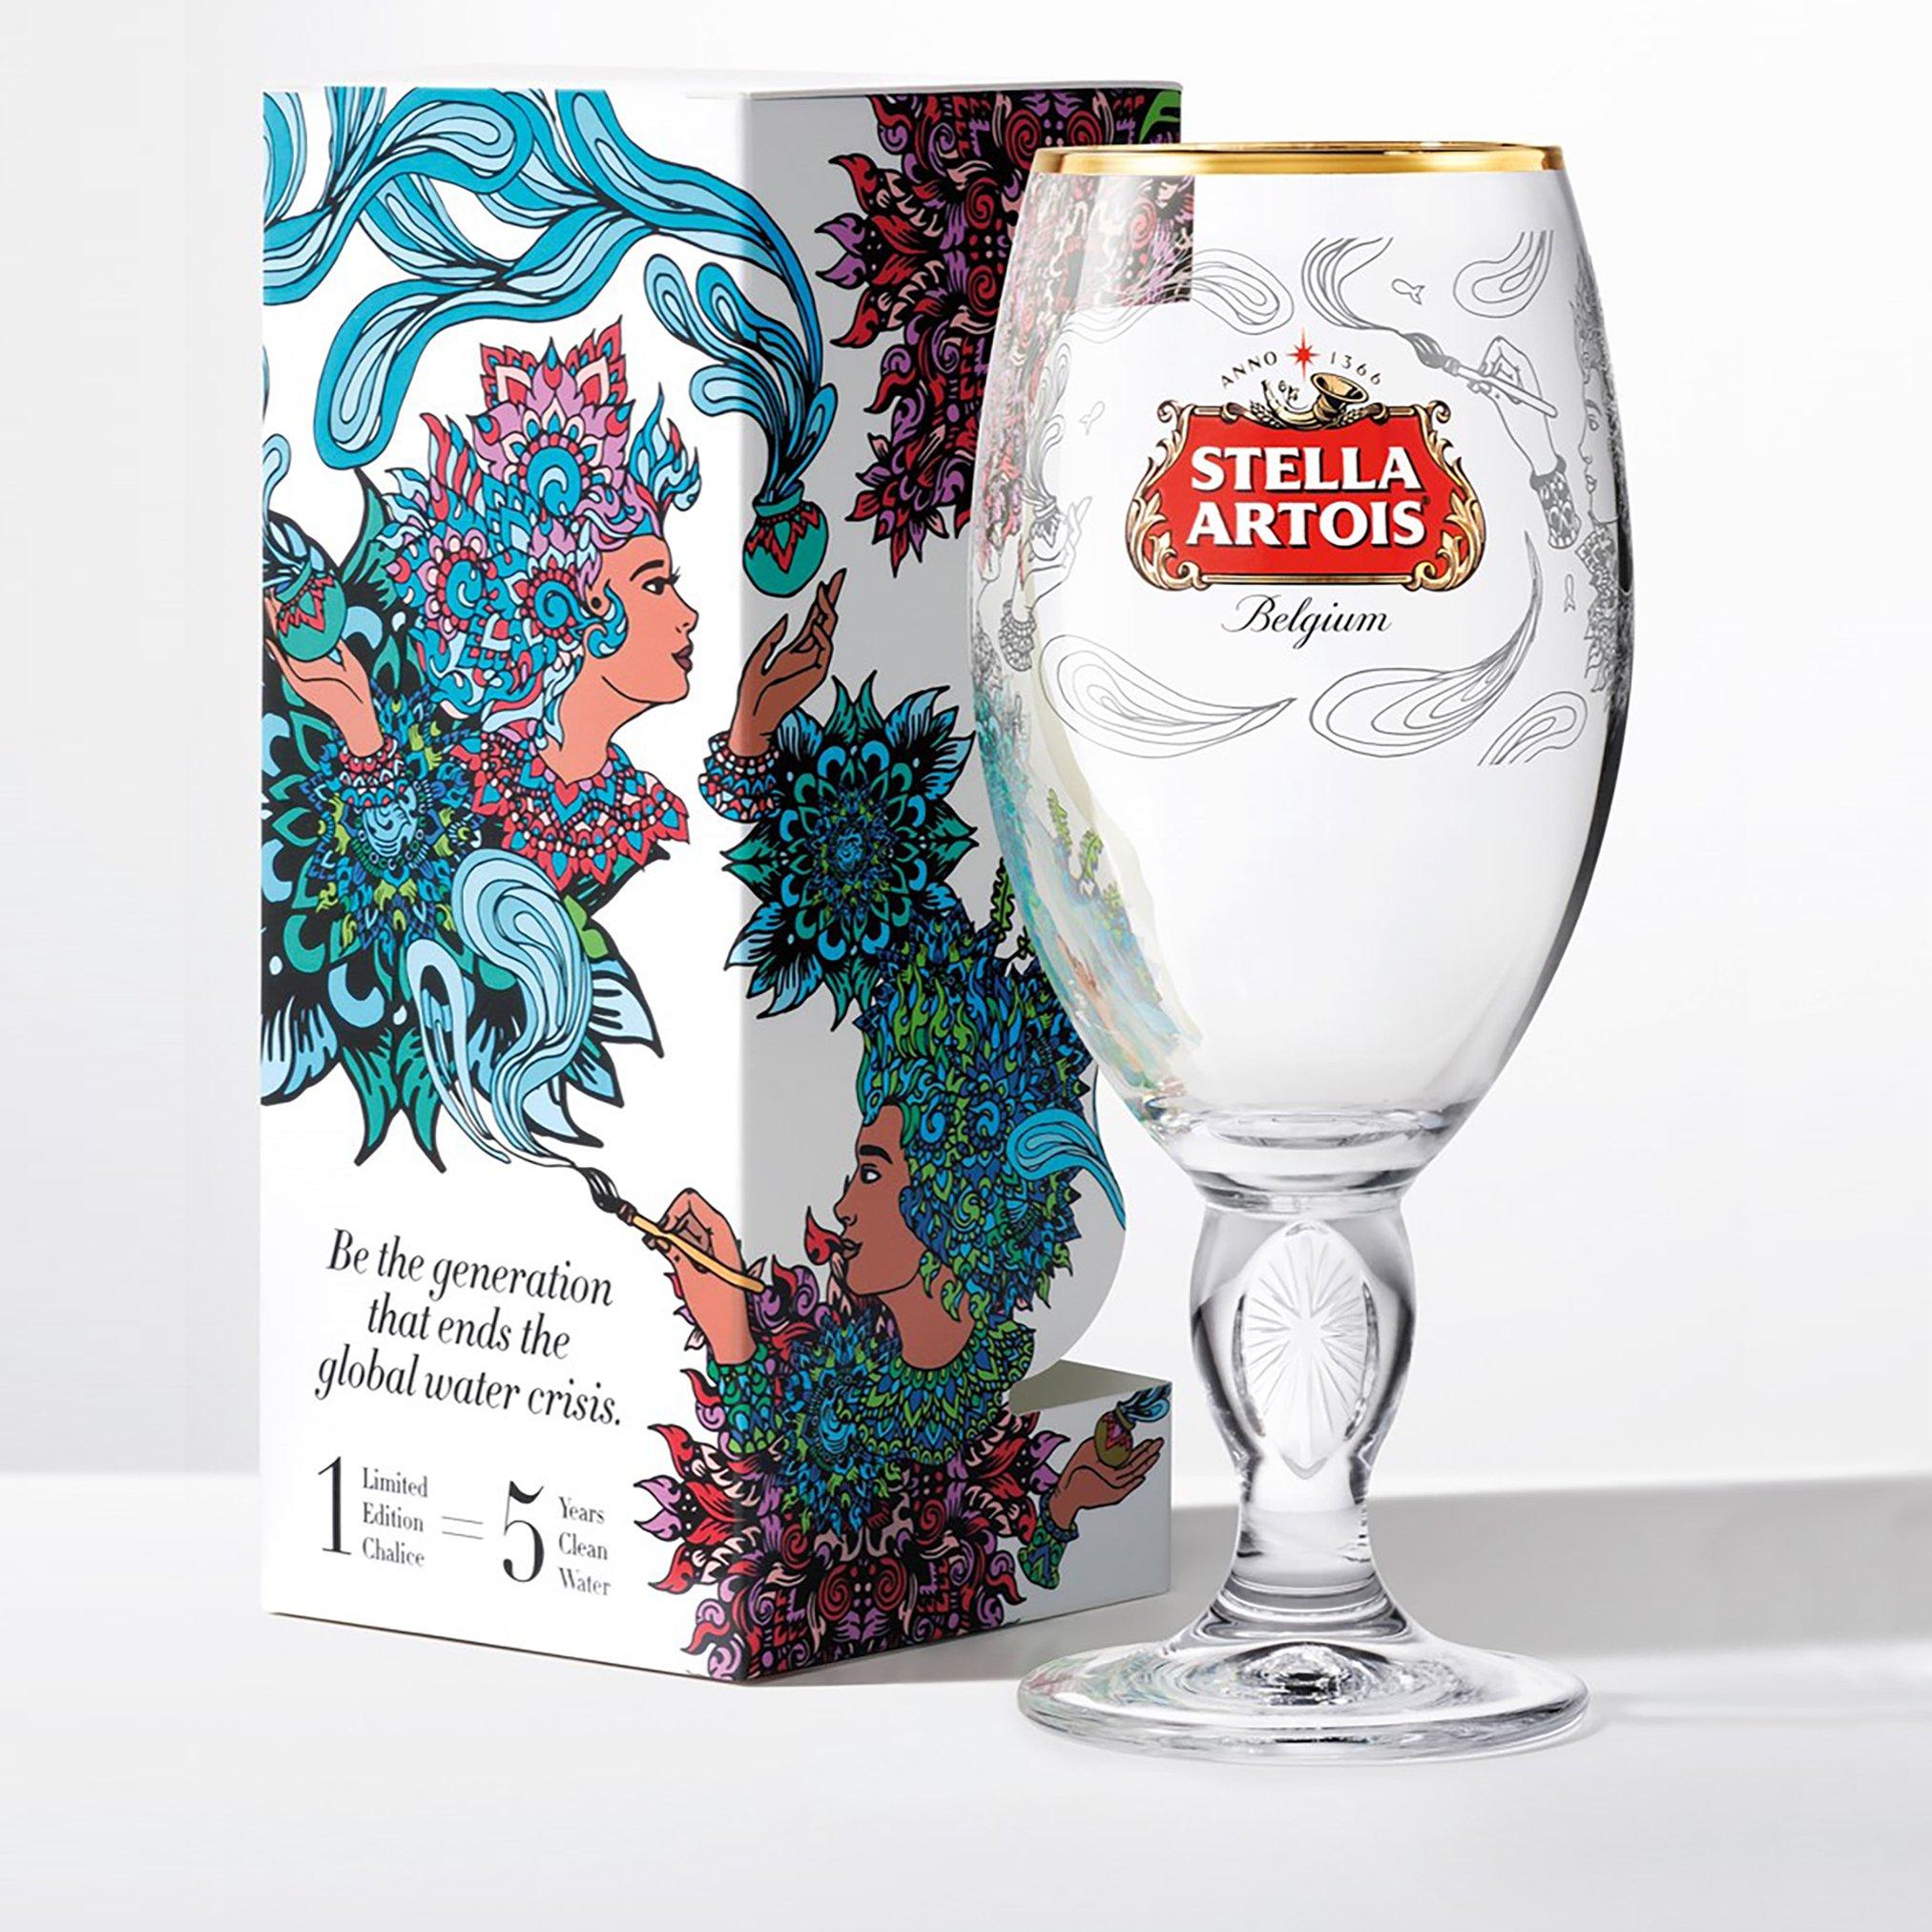 Stella Artois Limited Edition Cambodia Chalice, 33cl by Stella Artois (Image #2)